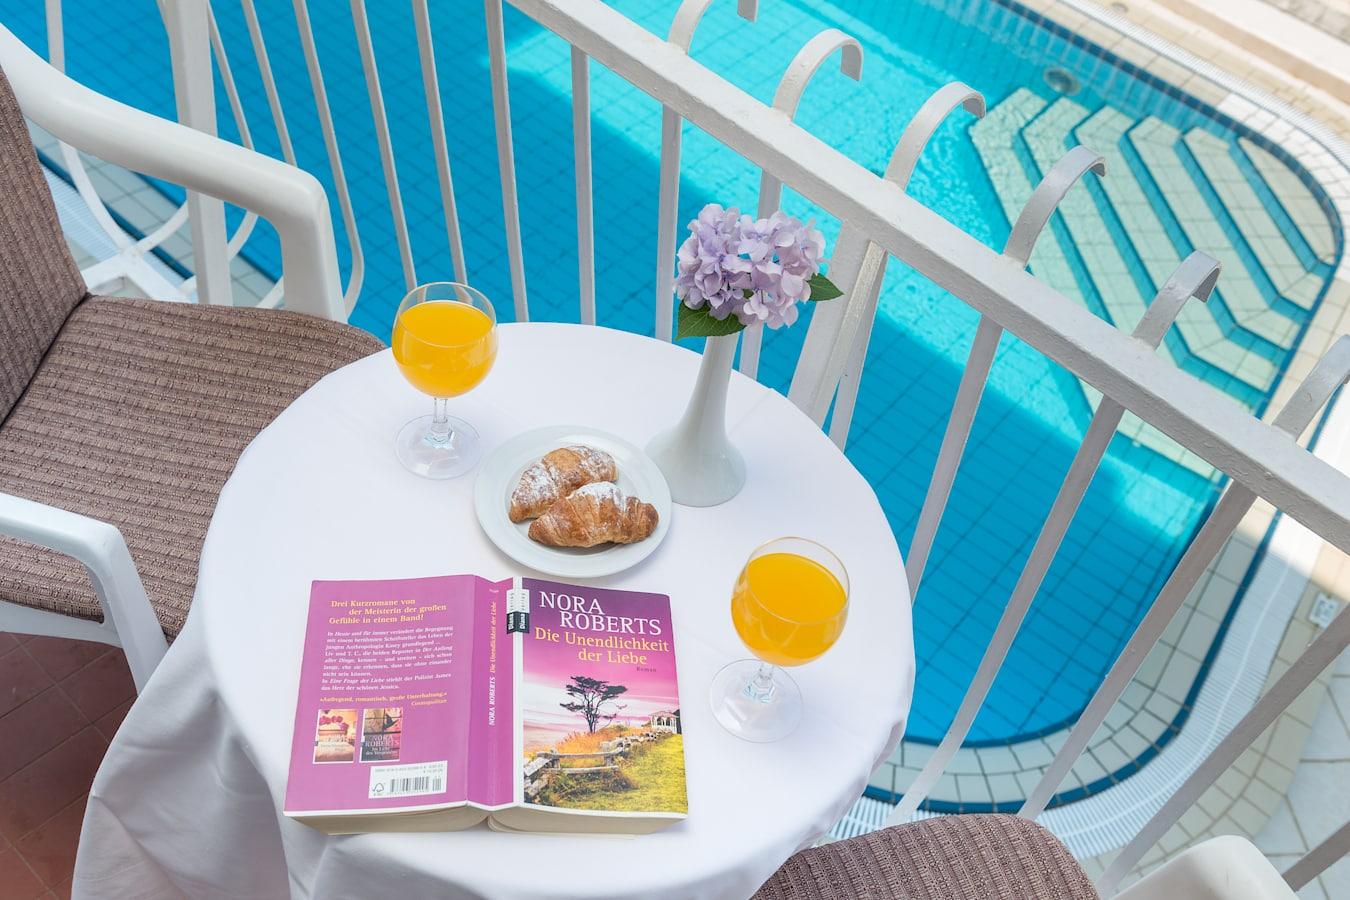 komodor-hotel-rooms-balcony-seaview-pool.jpg